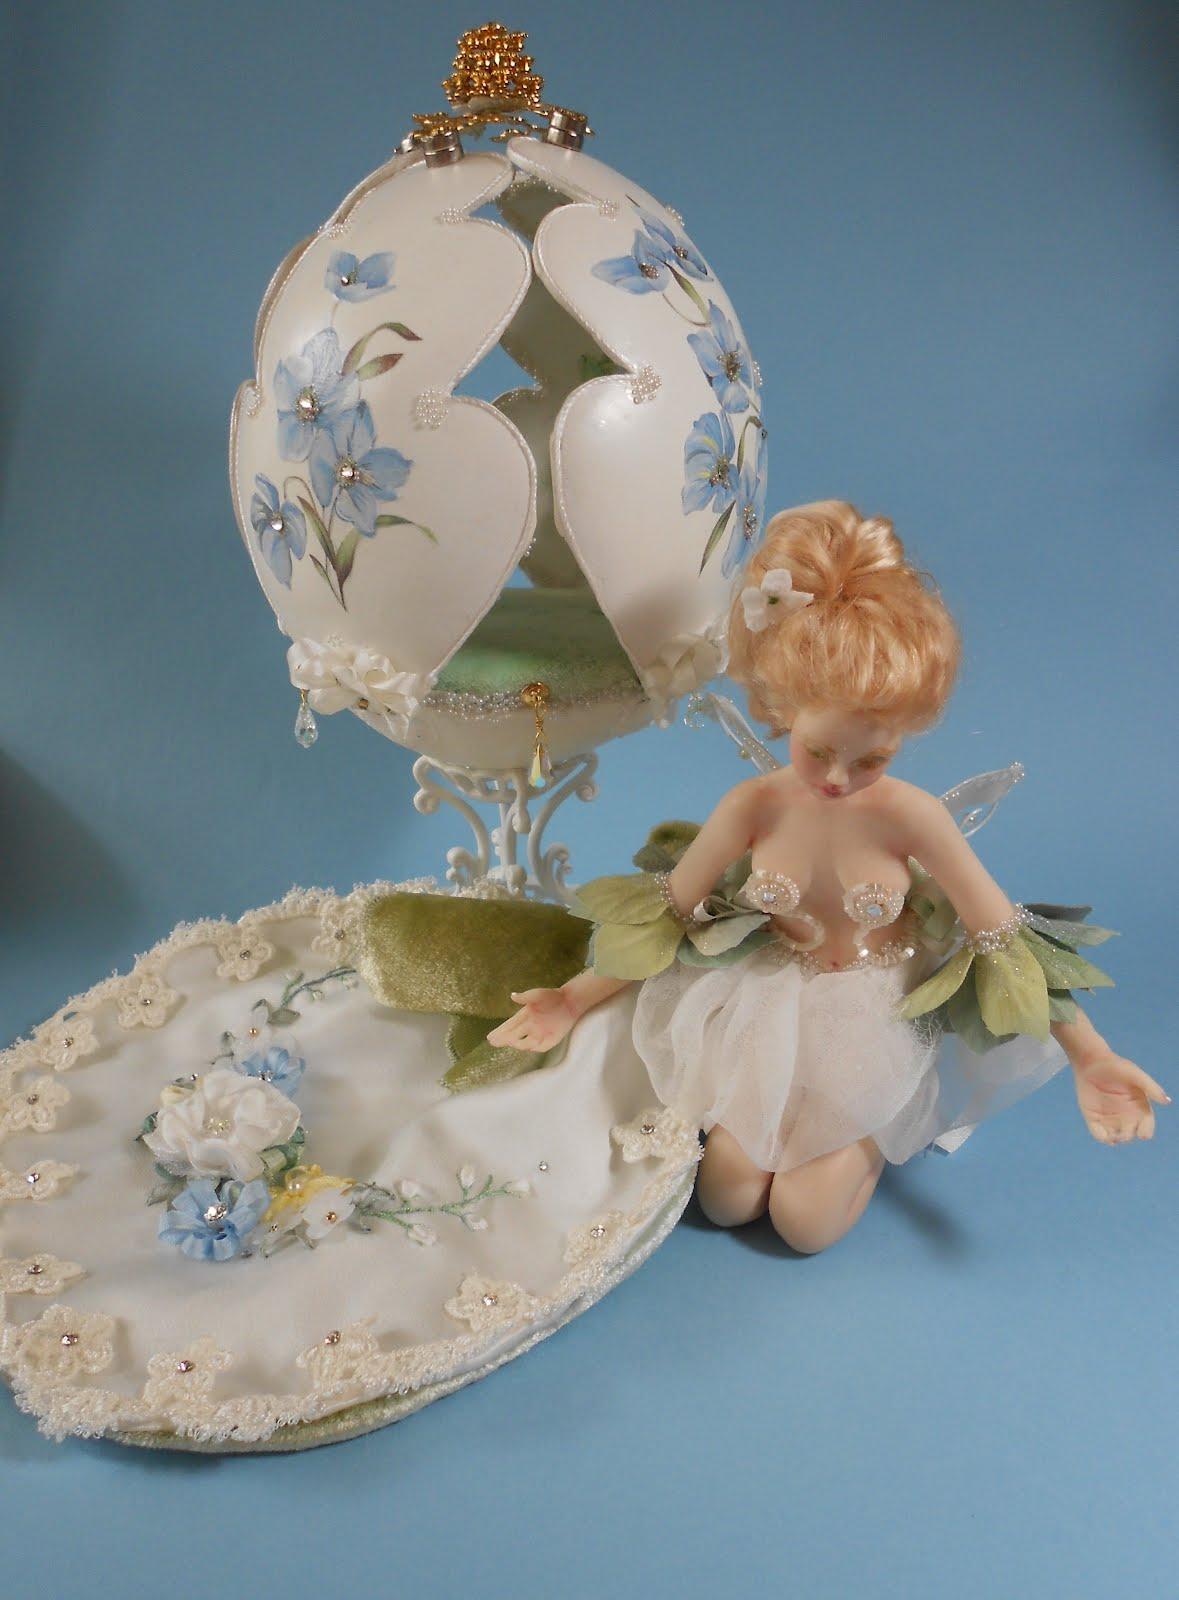 http://4.bp.blogspot.com/-KMGZtJJDPyM/T_uH-mJAZII/AAAAAAAAAws/M4OXxlY3s7I/s1600/ostrich+egg+ribbon+fairy+1.jpg